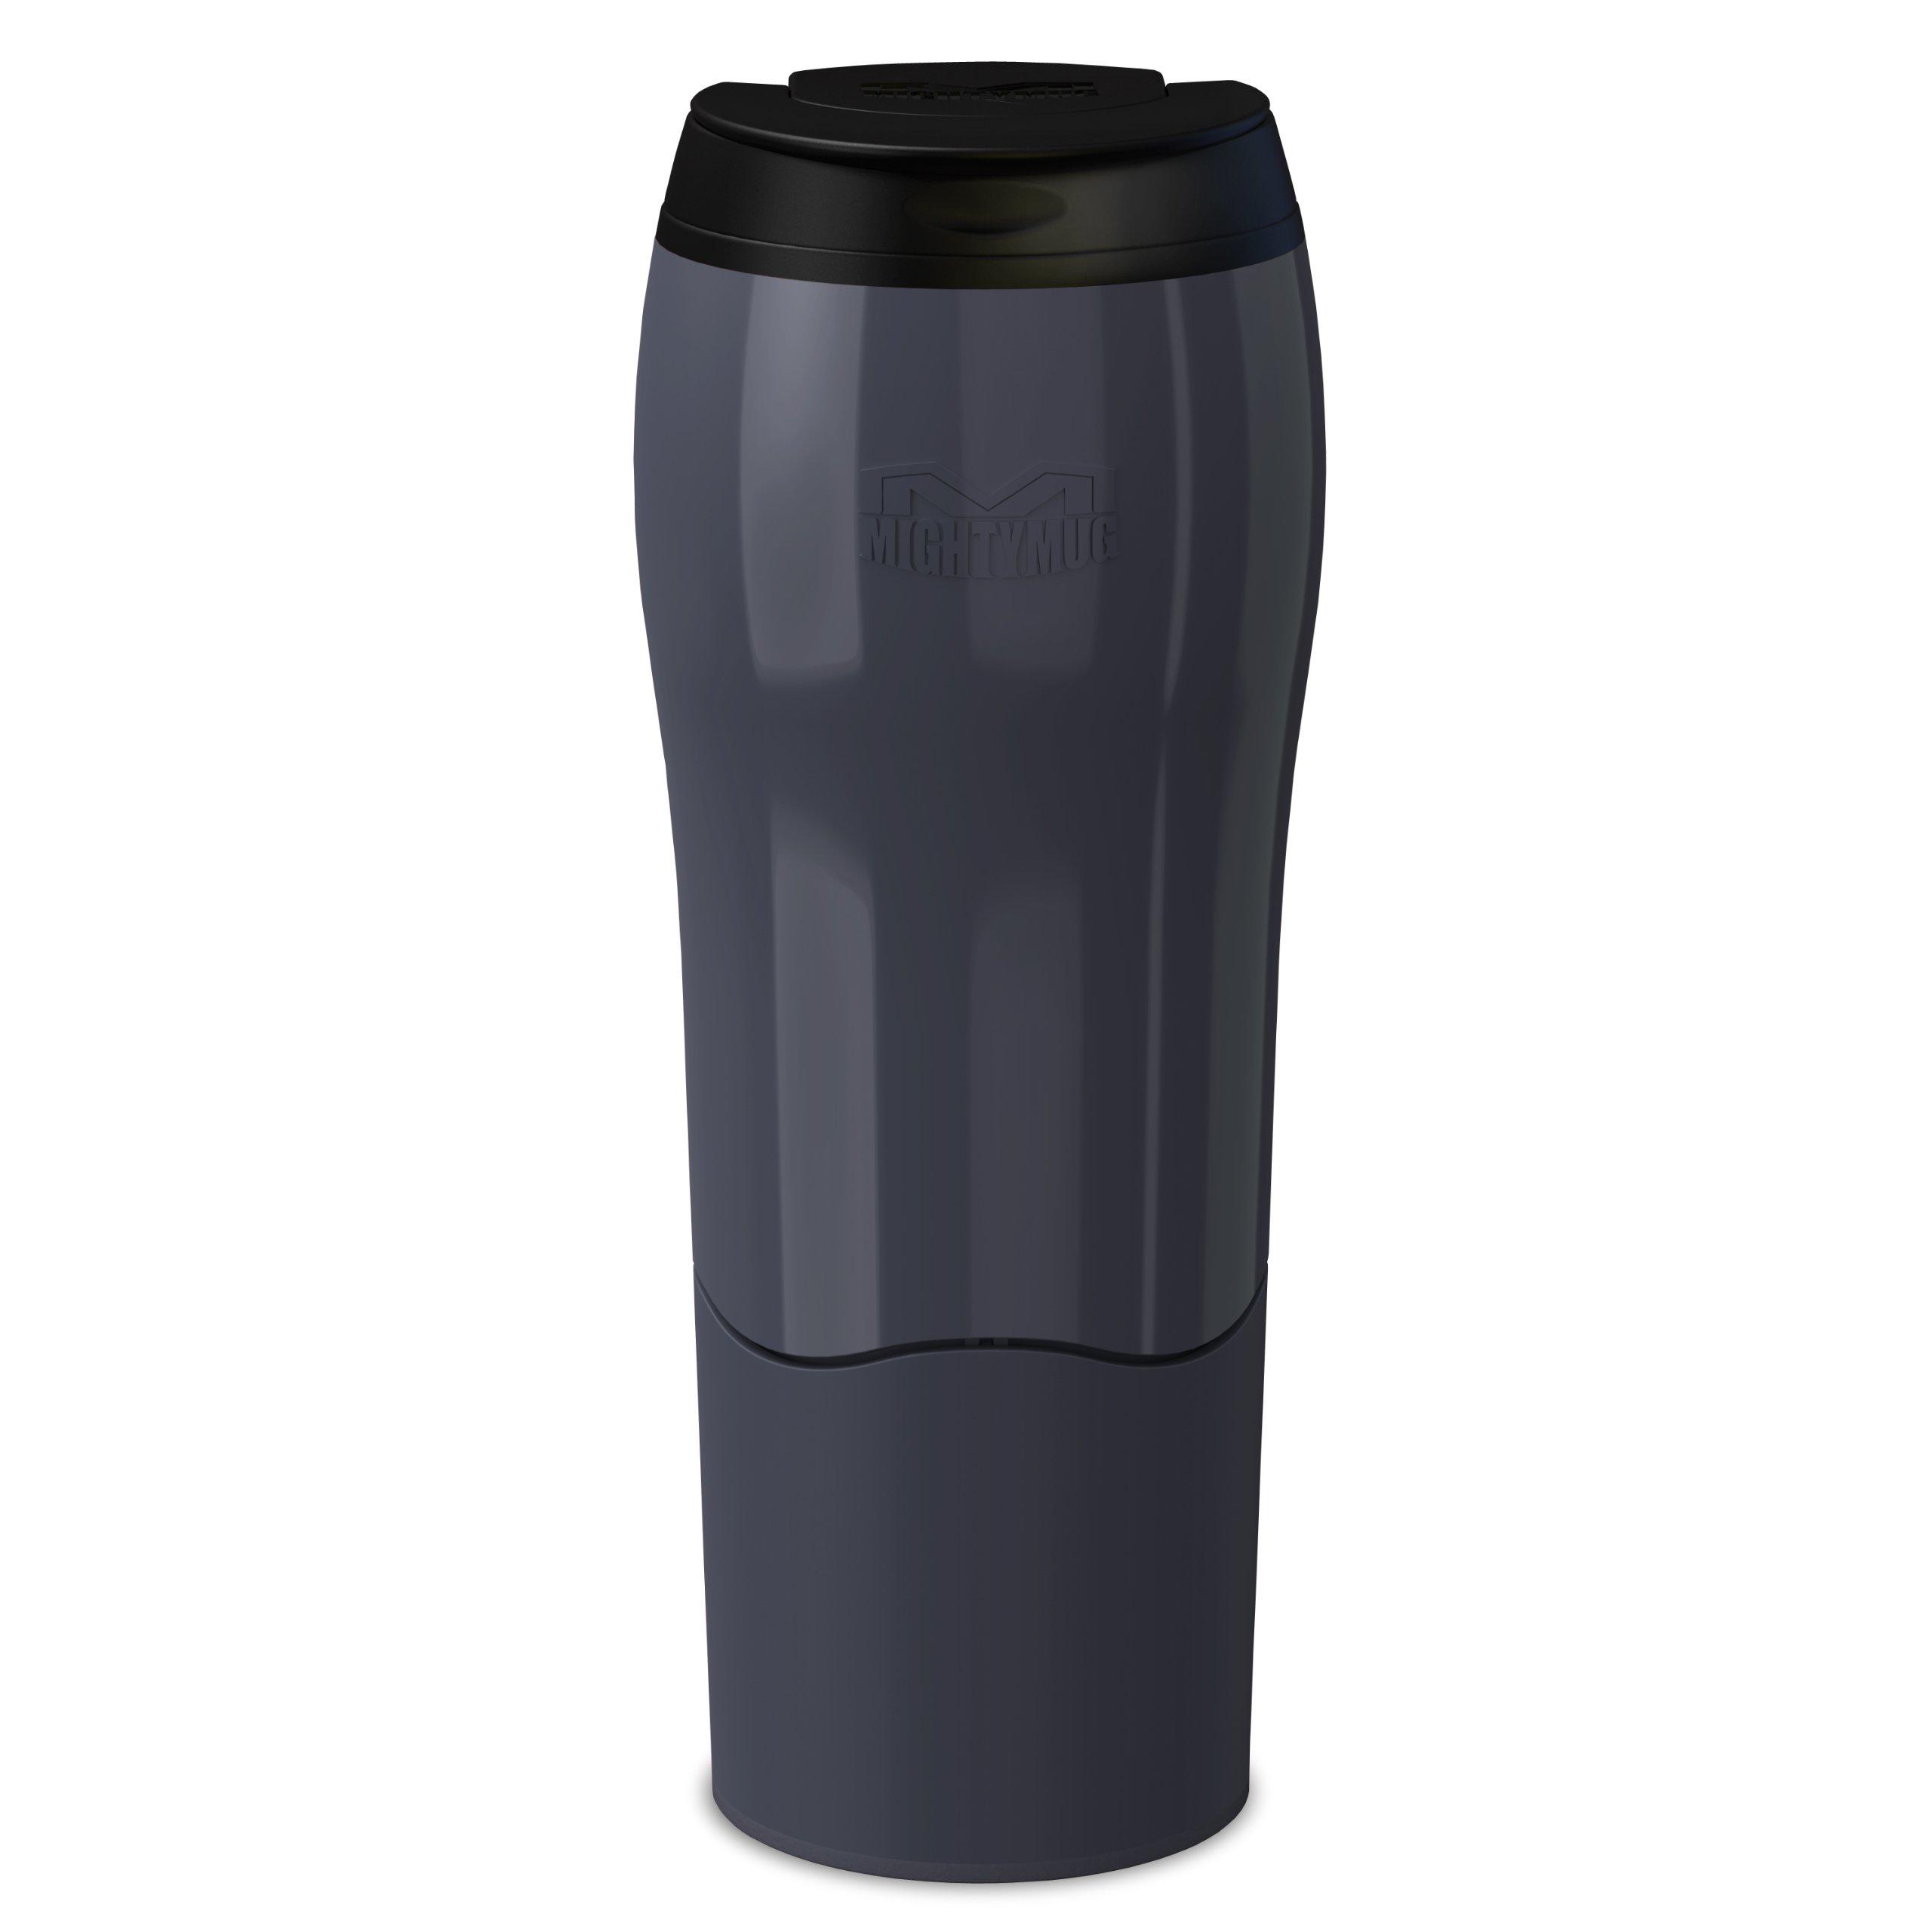 Dexam Mighty Mug Travel Mug 'the mug that won't fall over' Thermos in Charcoal Black 17920227